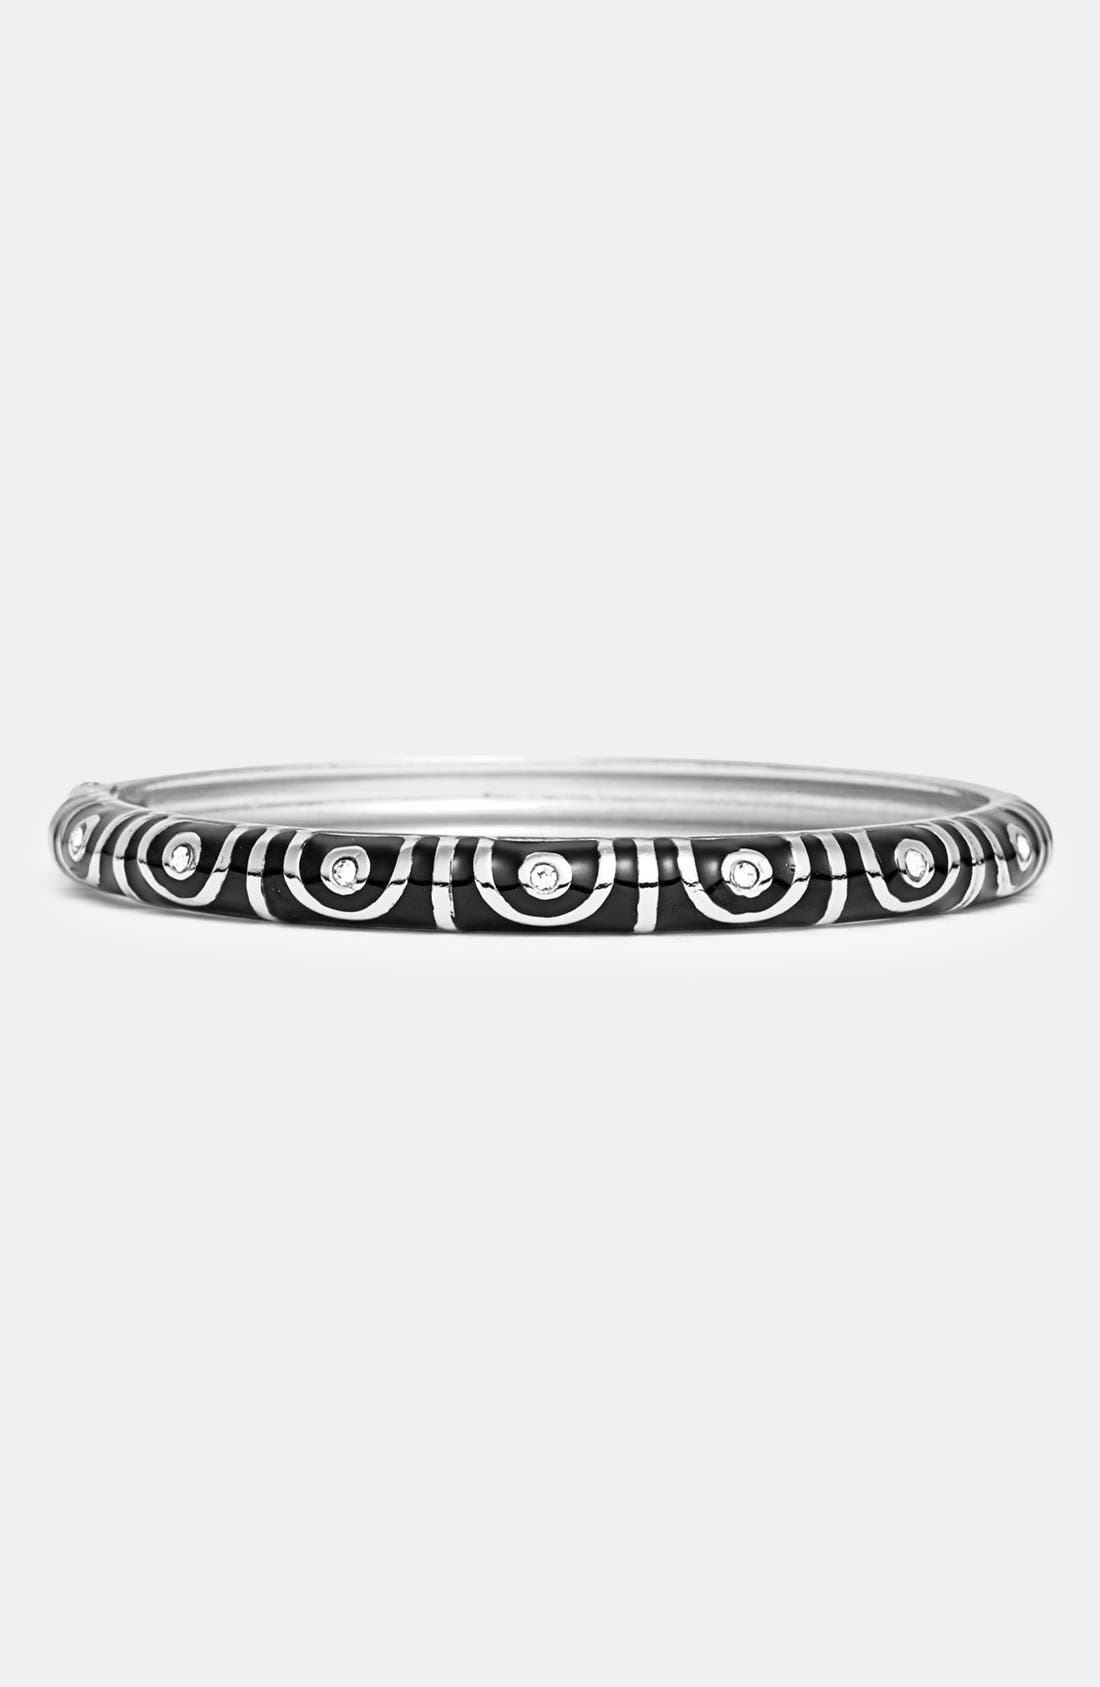 Alternate Image 1 Selected - Sequin Small Hinged Bangle Bracelet